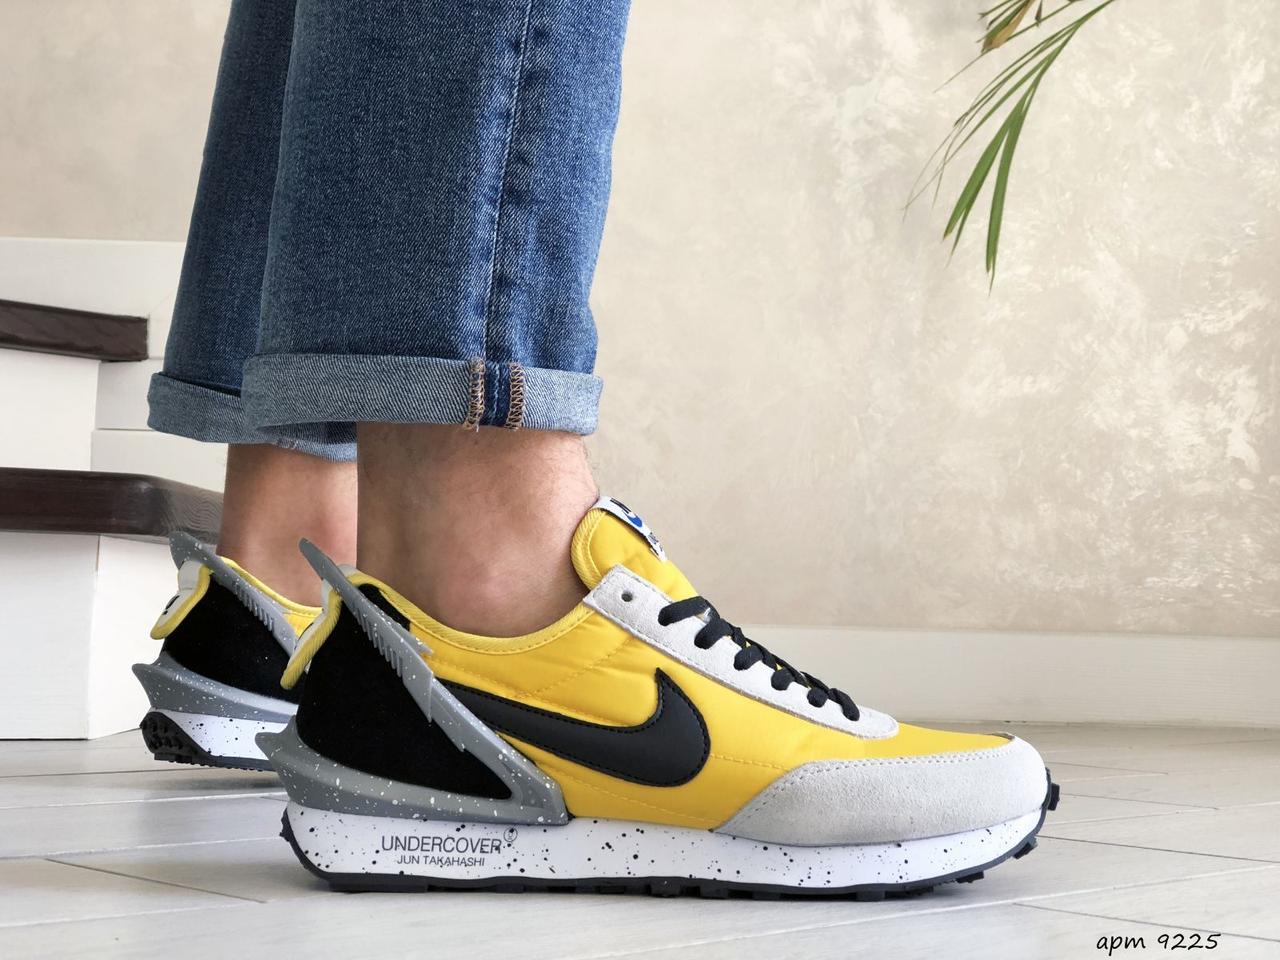 Кроссовки мужские Nike Undercover Jun Takahashi желтые